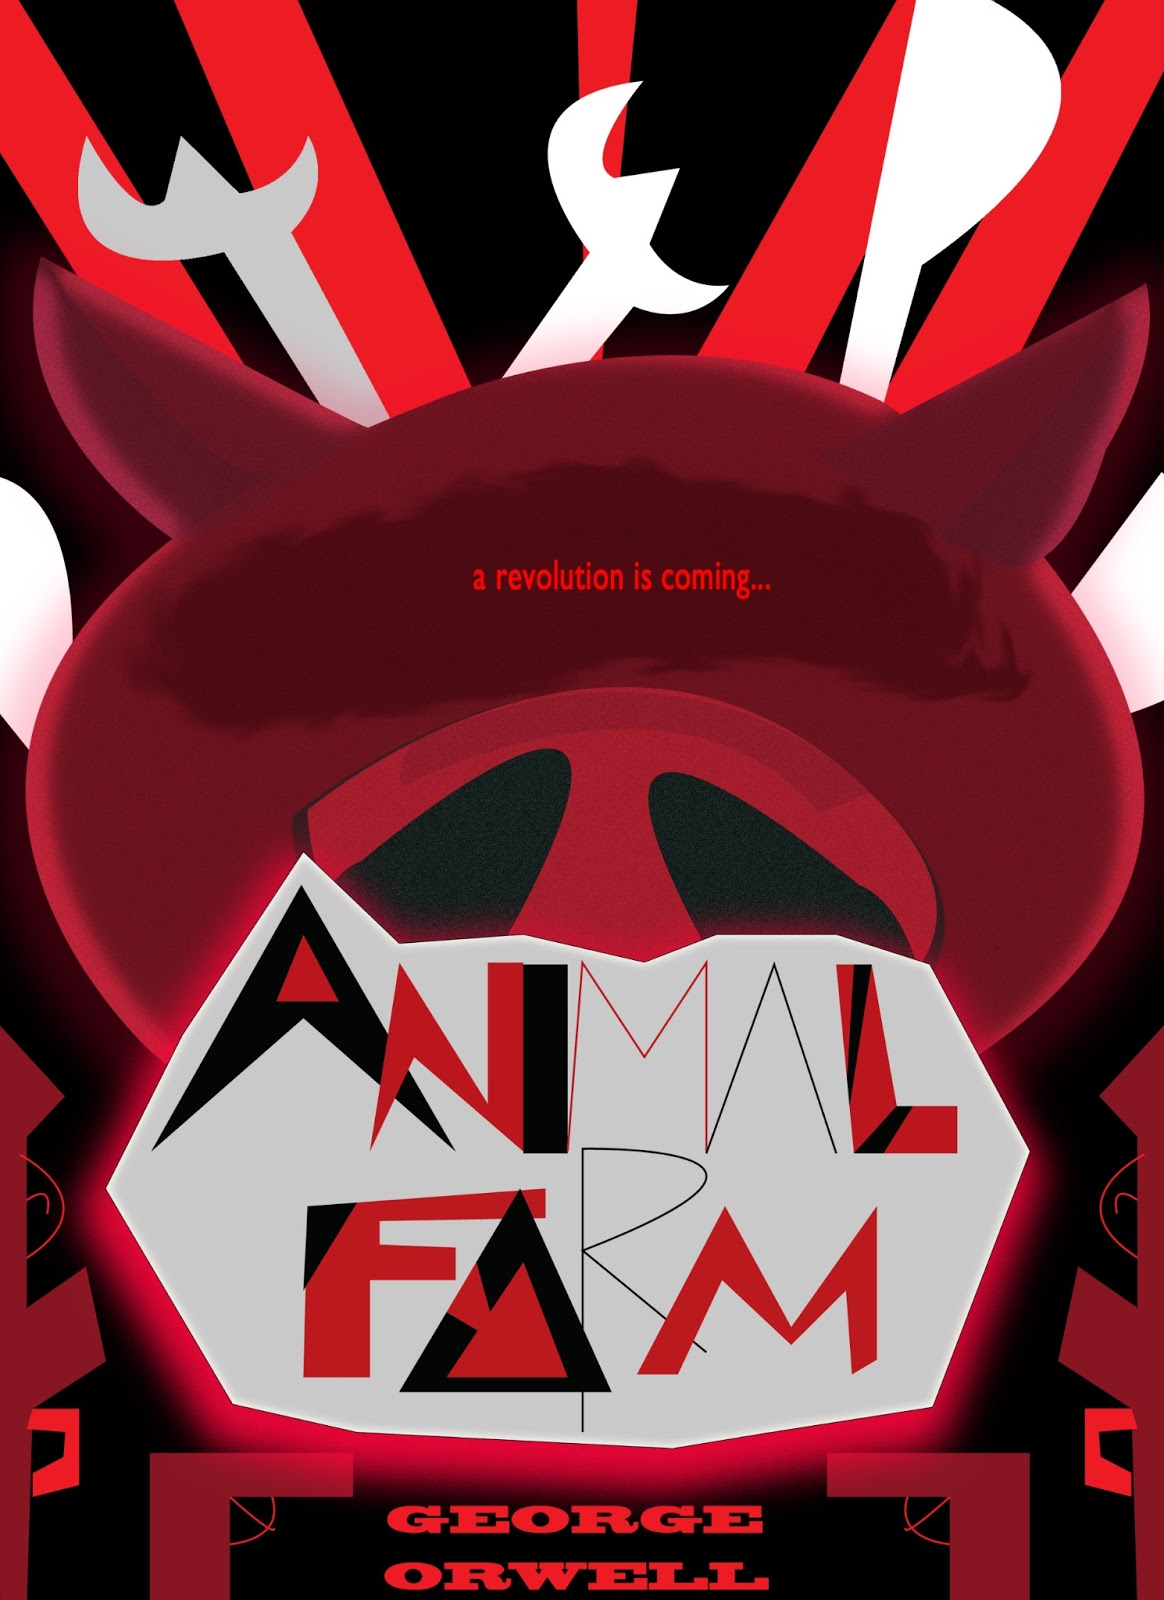 Book Cover Design Near Me : Roundedme animal farm book cover